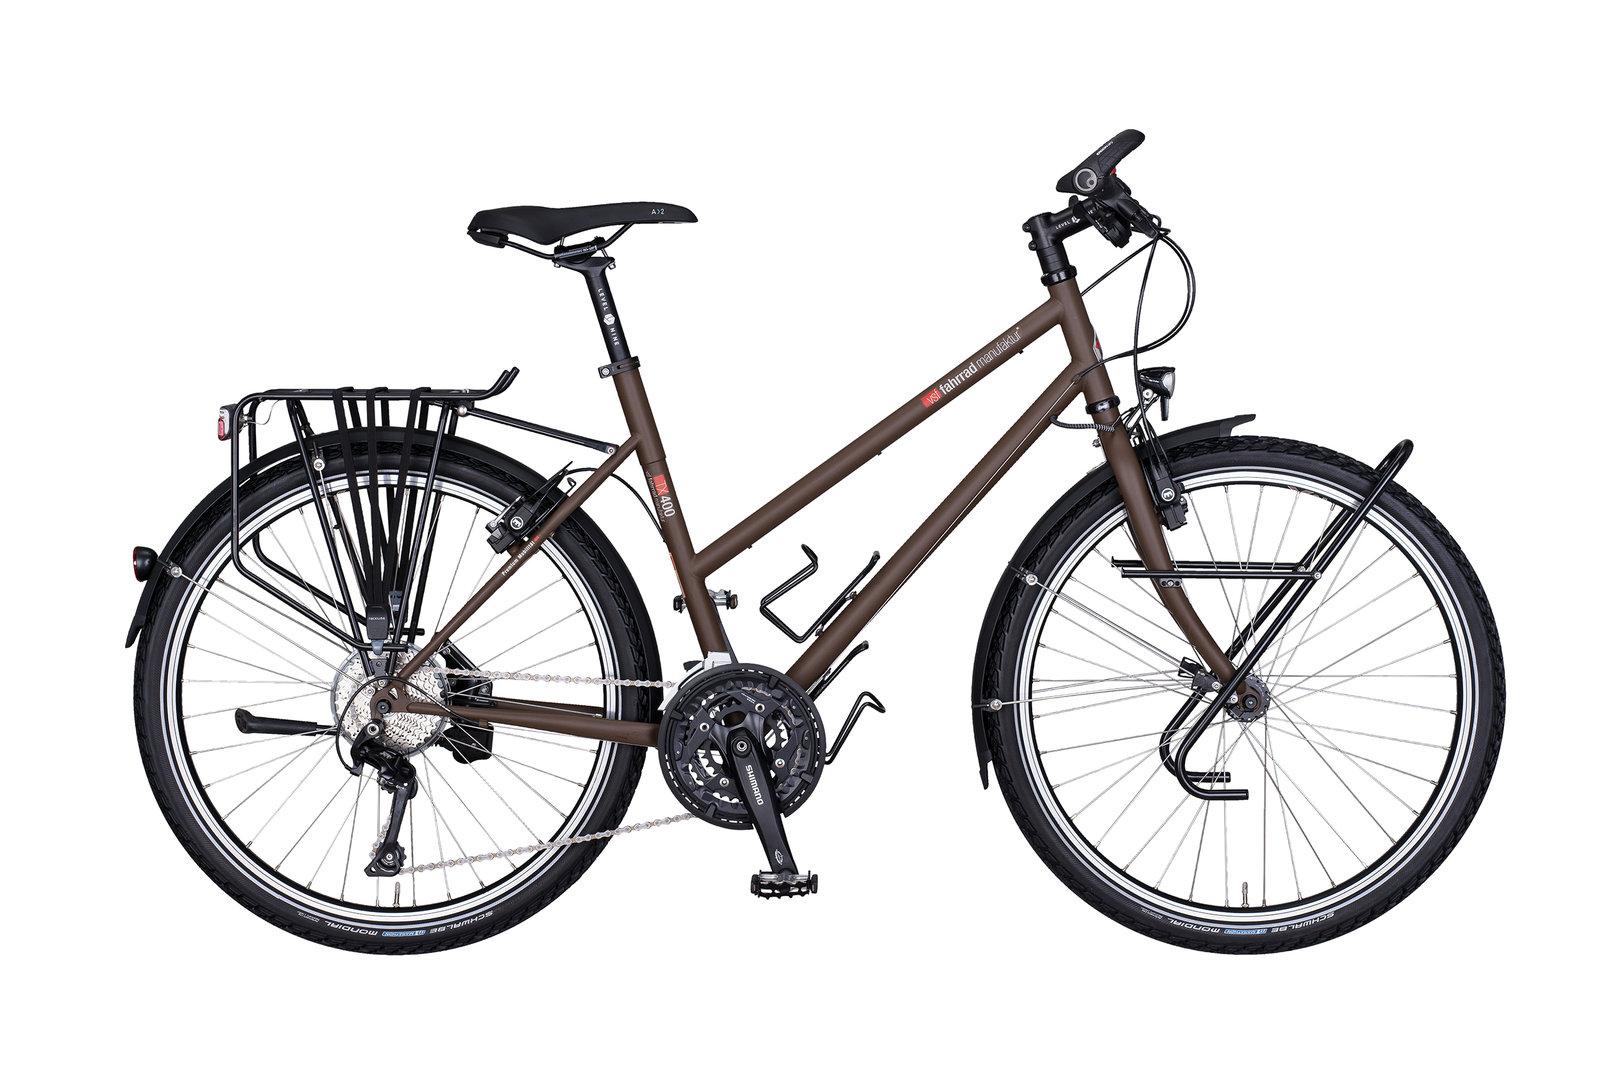 Vsf Fahrradmanufaktur Tx 400 Shimano Deore Xt Trekking Bike Neu